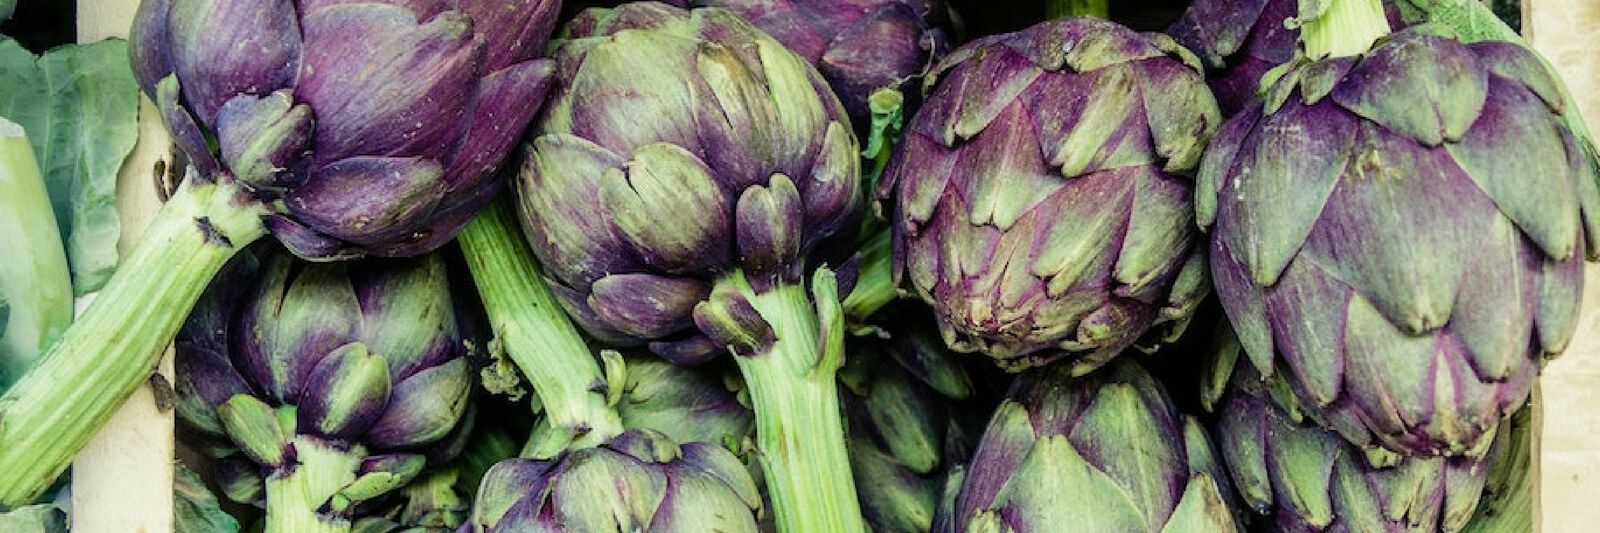 The Ketogenic Diet Food List